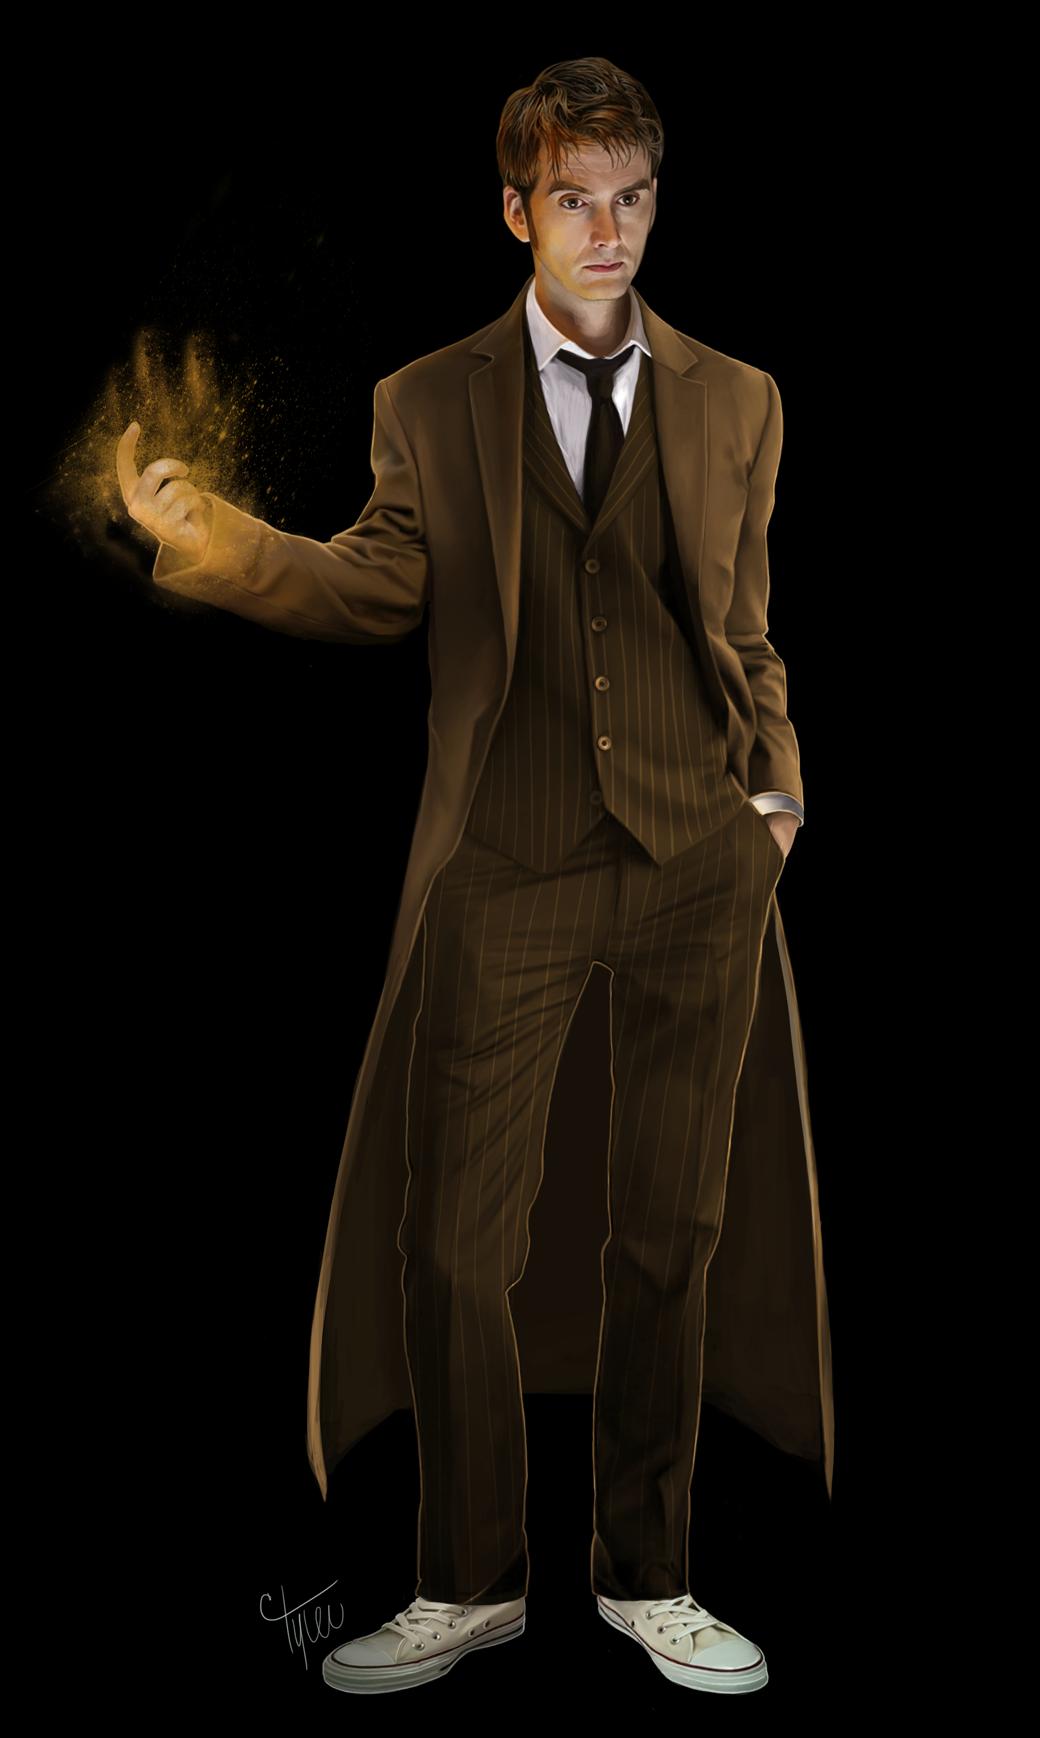 art doctor who the doctor David Tennant ten Tenth Doctor regeneration